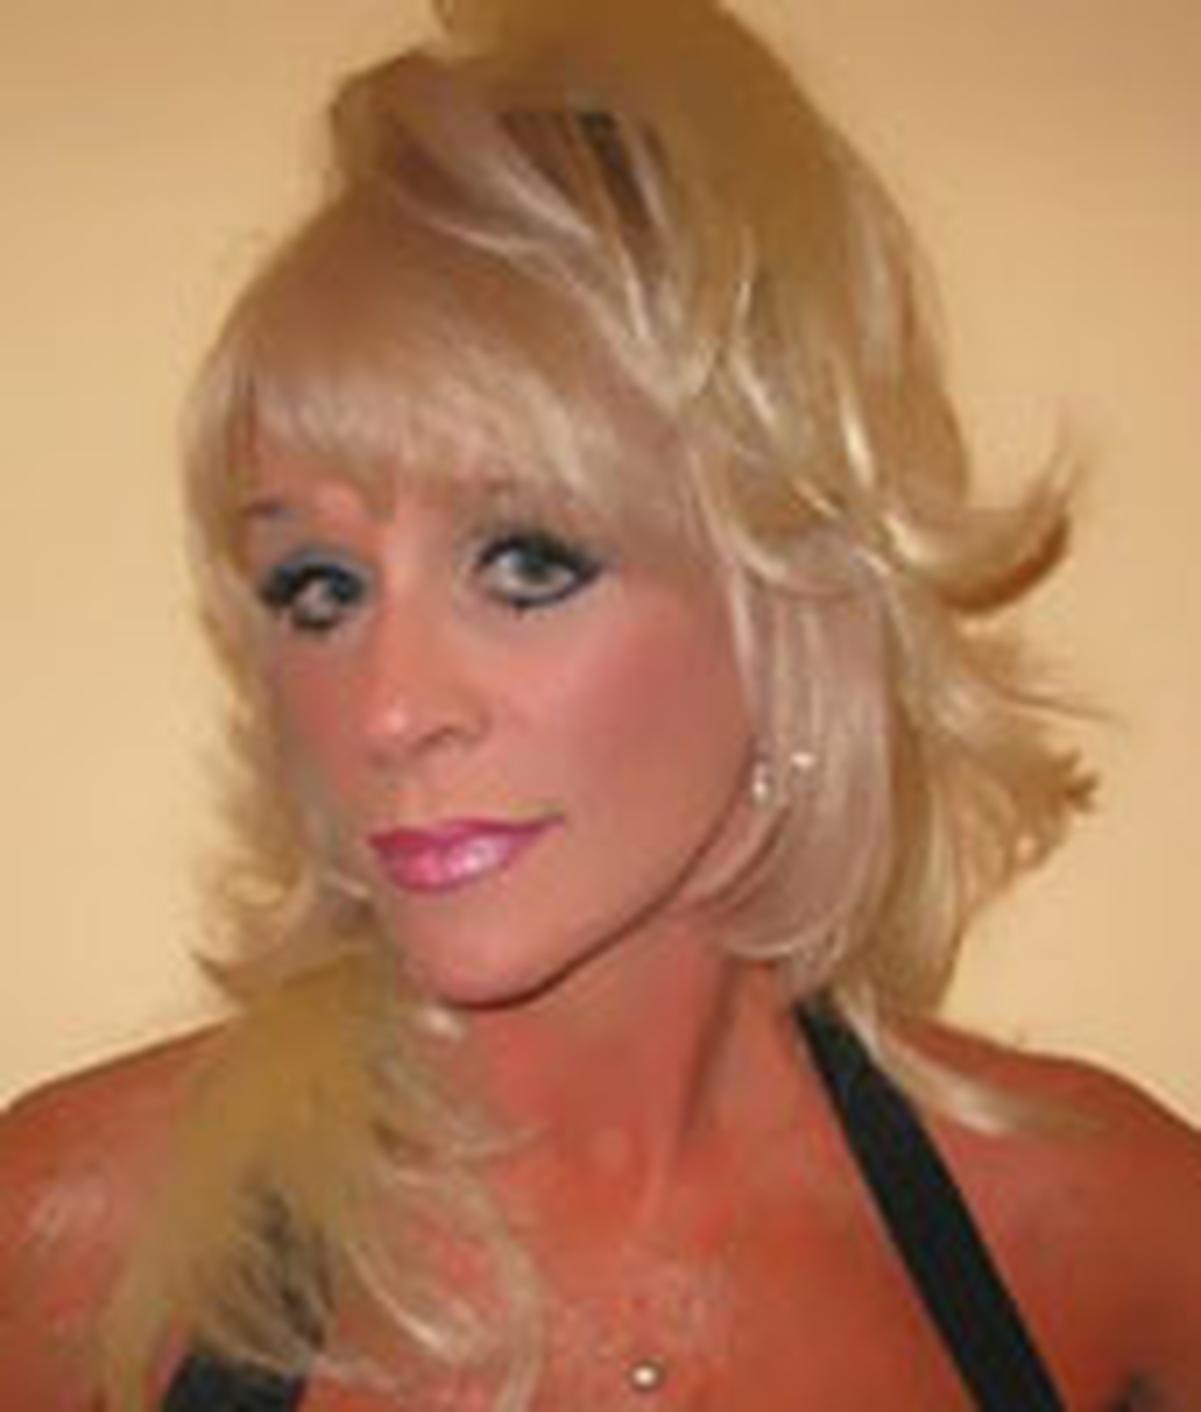 Kathy Willets | Wiki | Everipedia